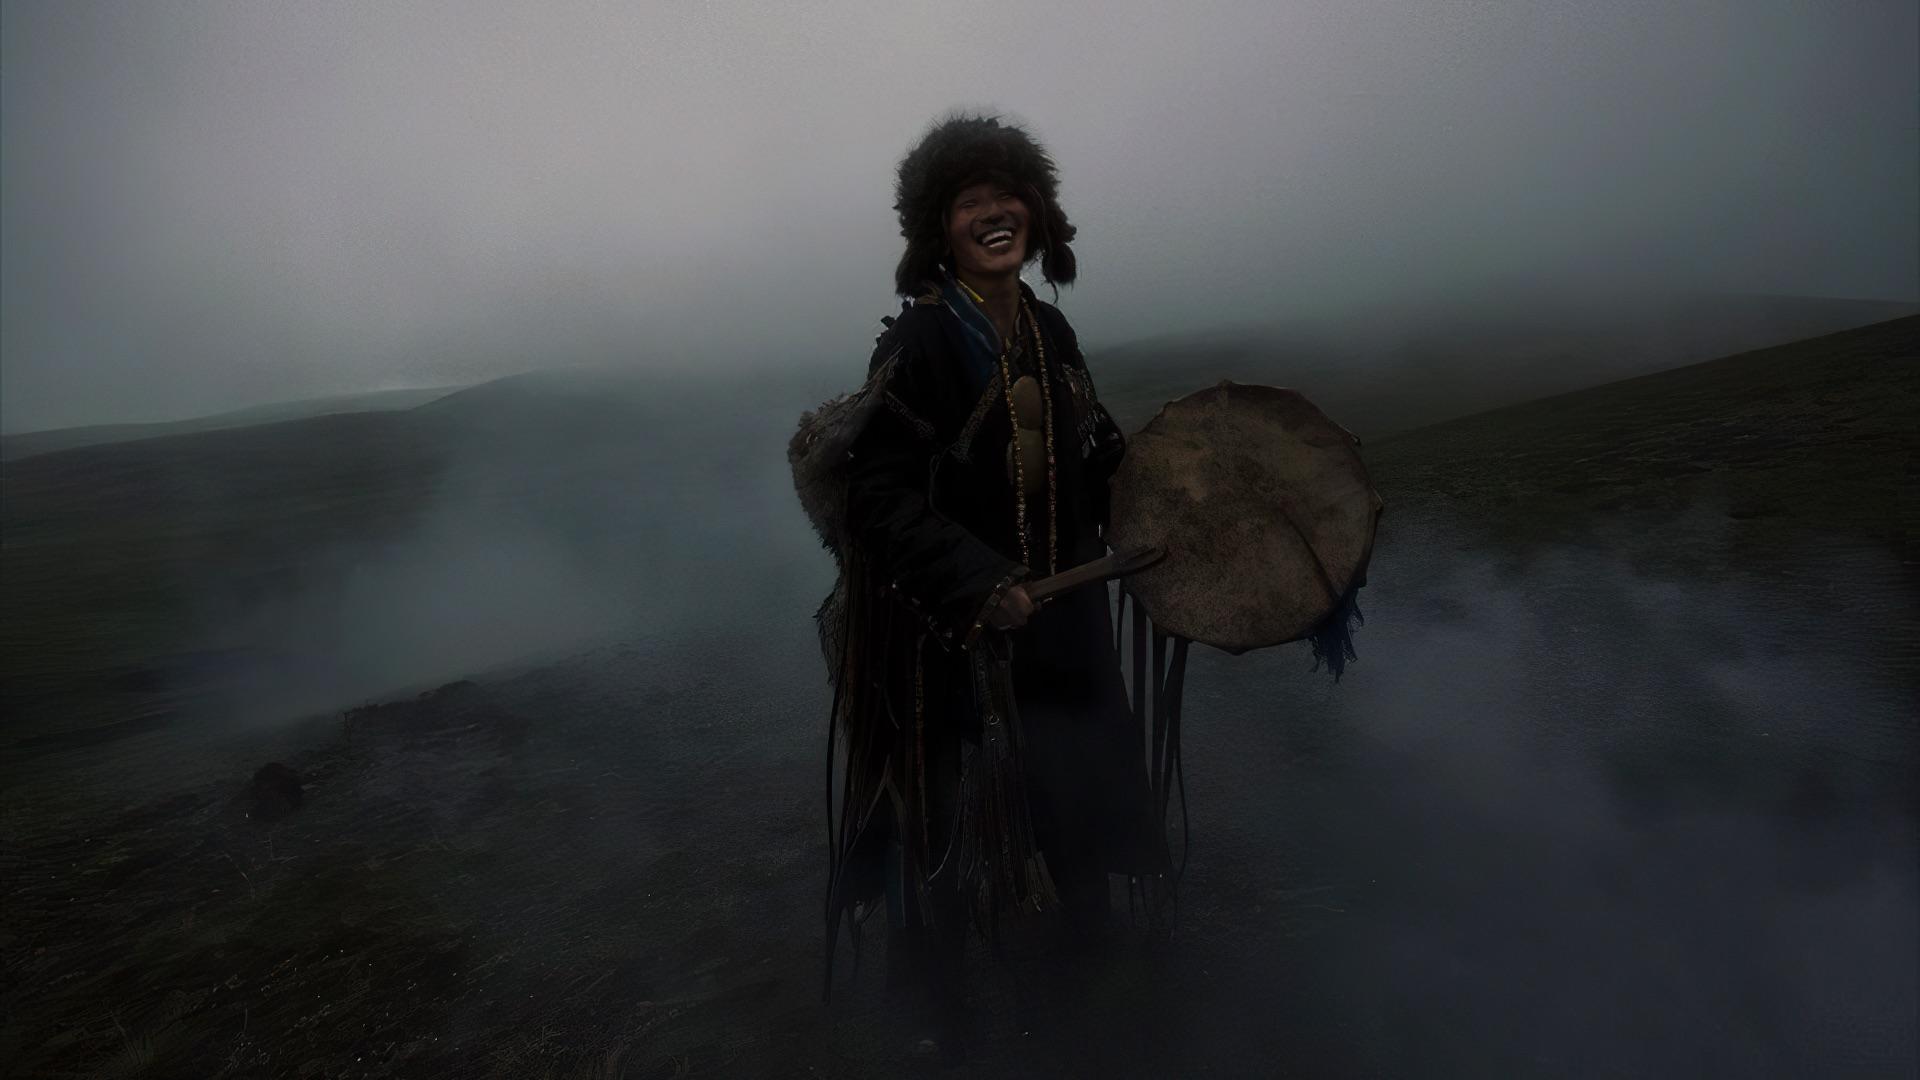 shaman in the night